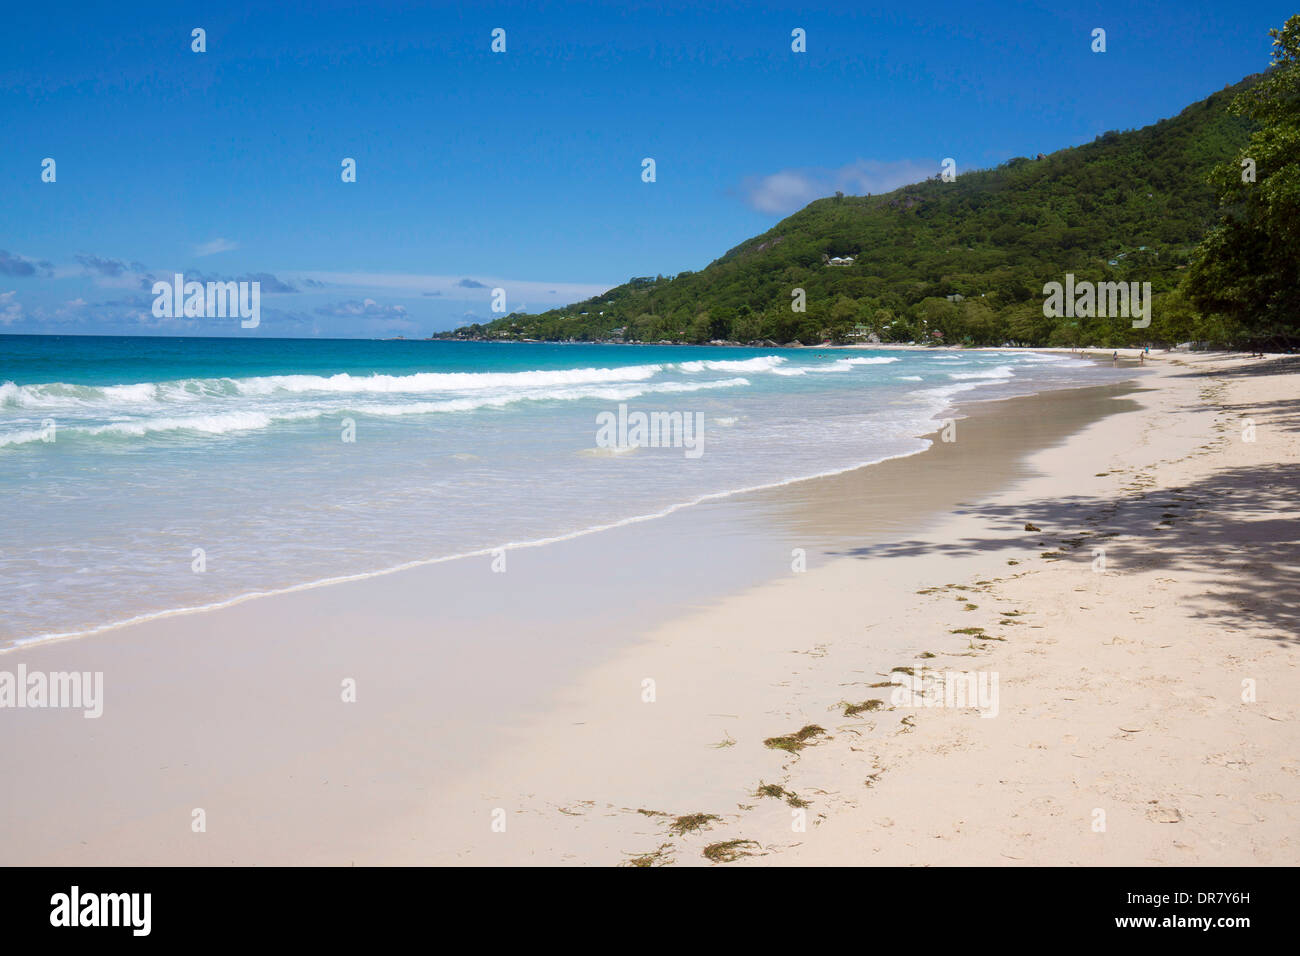 Deserted beach, Beau Vallon, Mahe, Seychelles - Stock Image